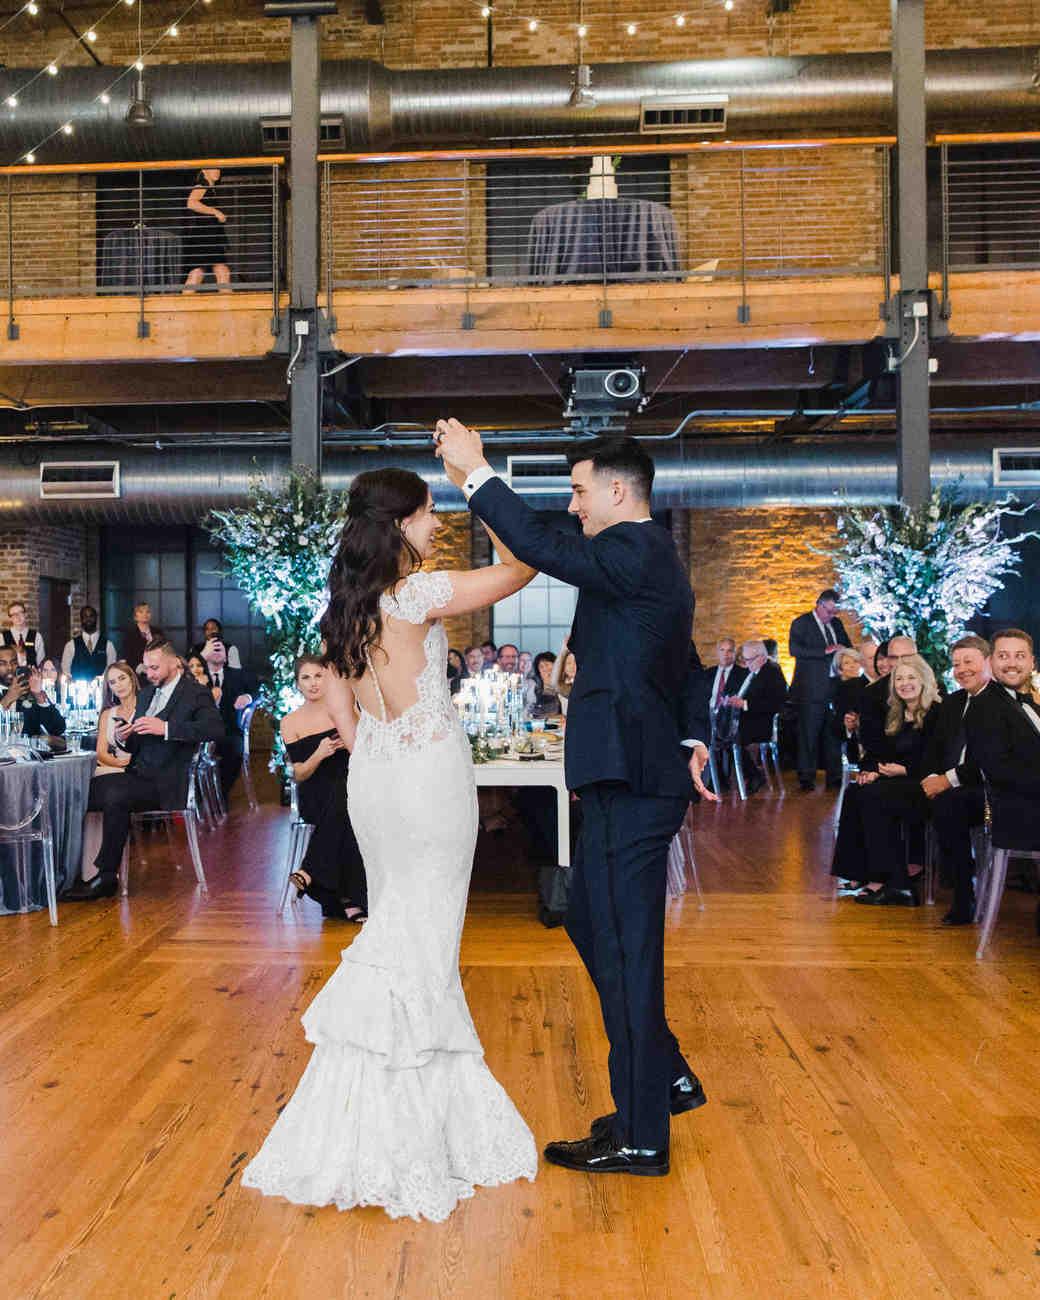 wedding reception bride groom first dance